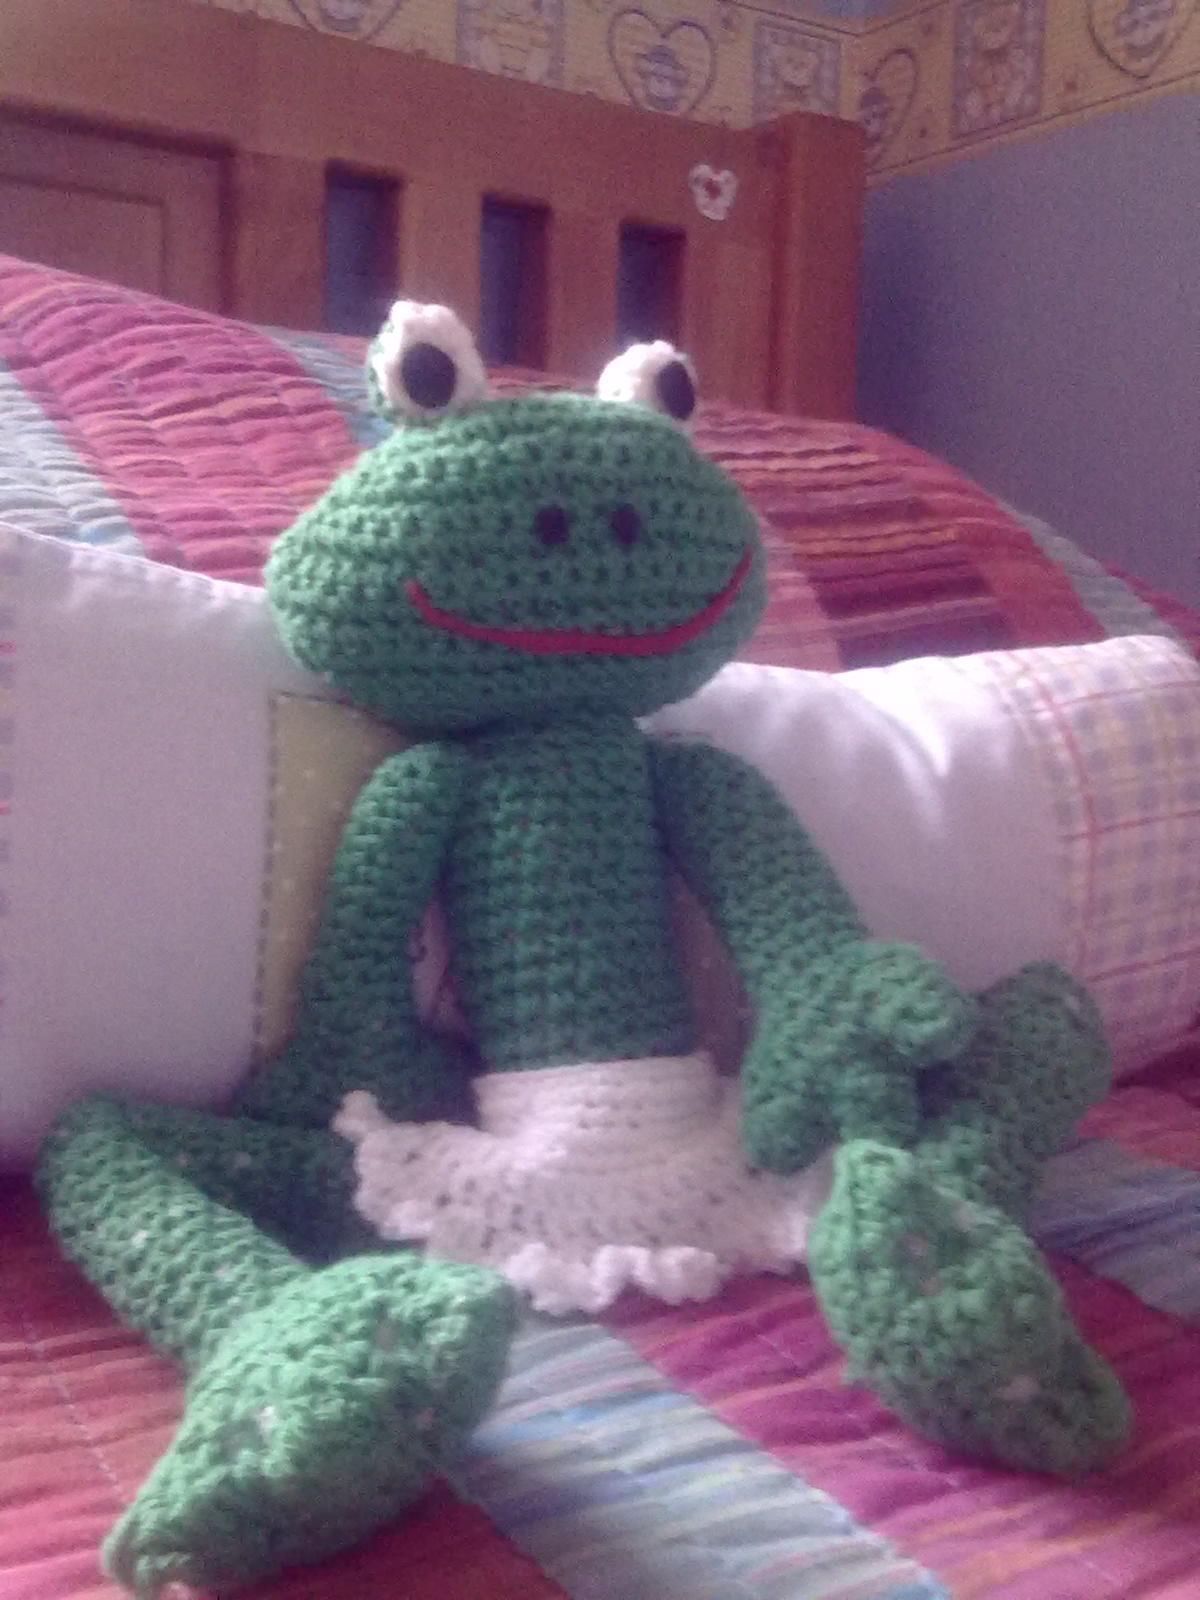 Rana A crochet en algodón verde